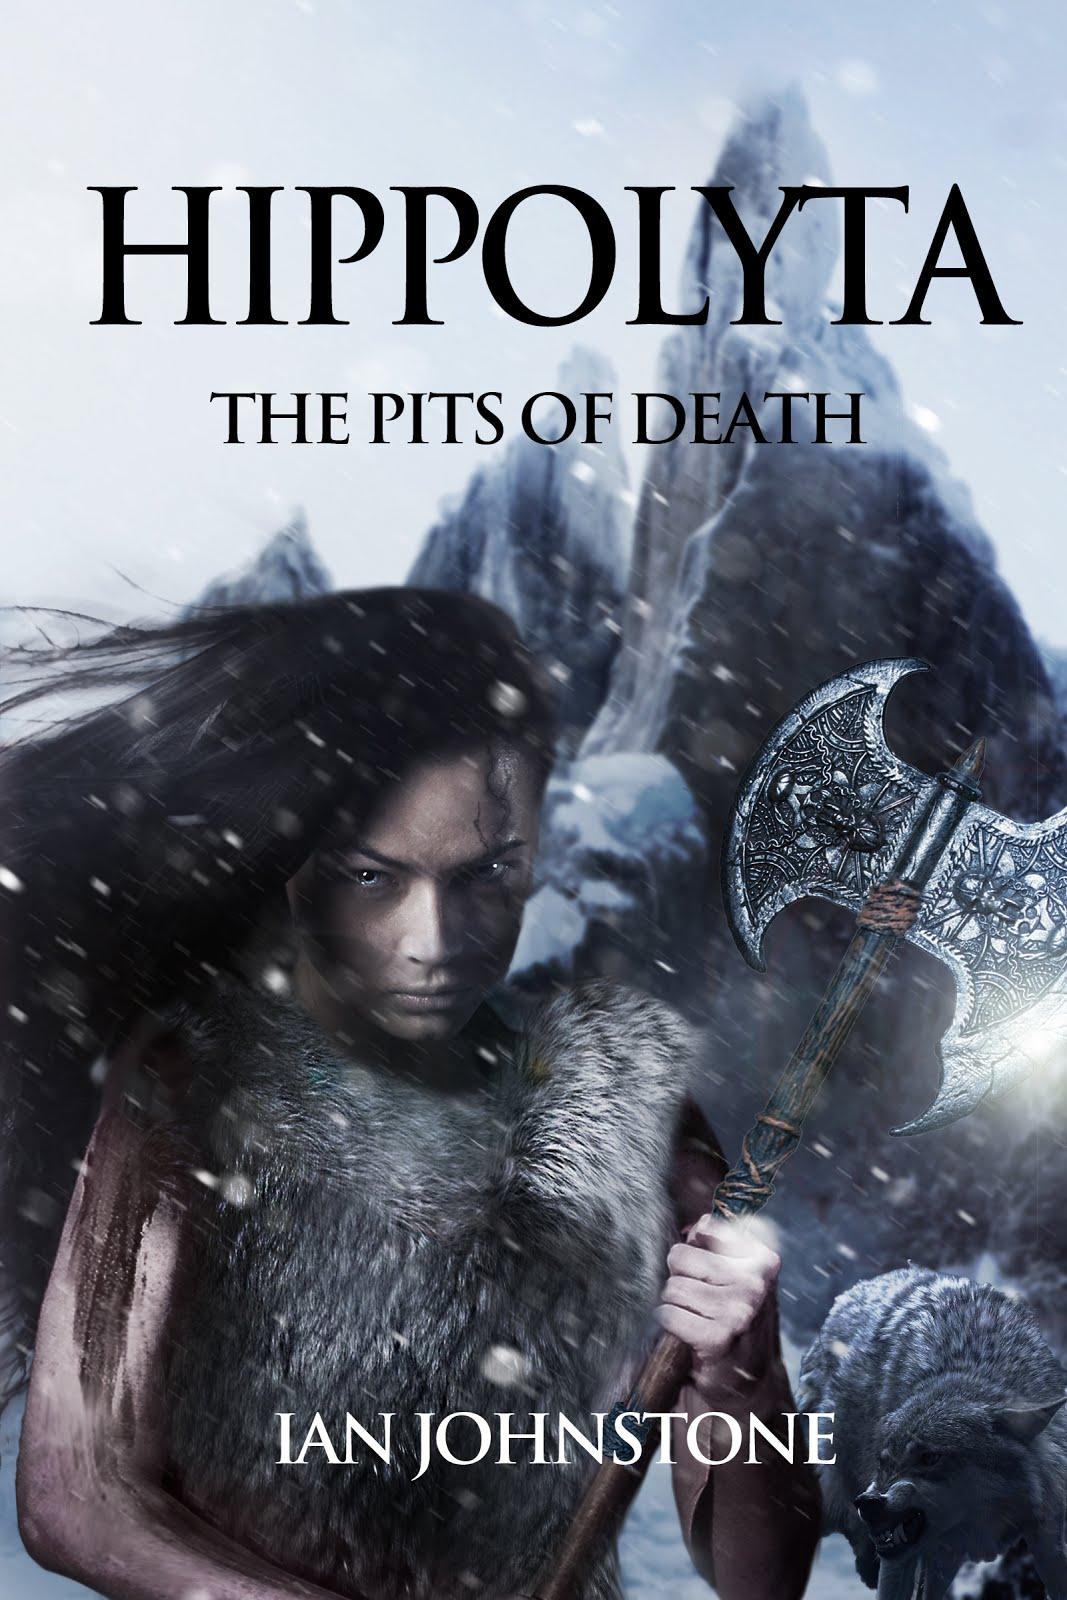 HIPPOLYTA [2]